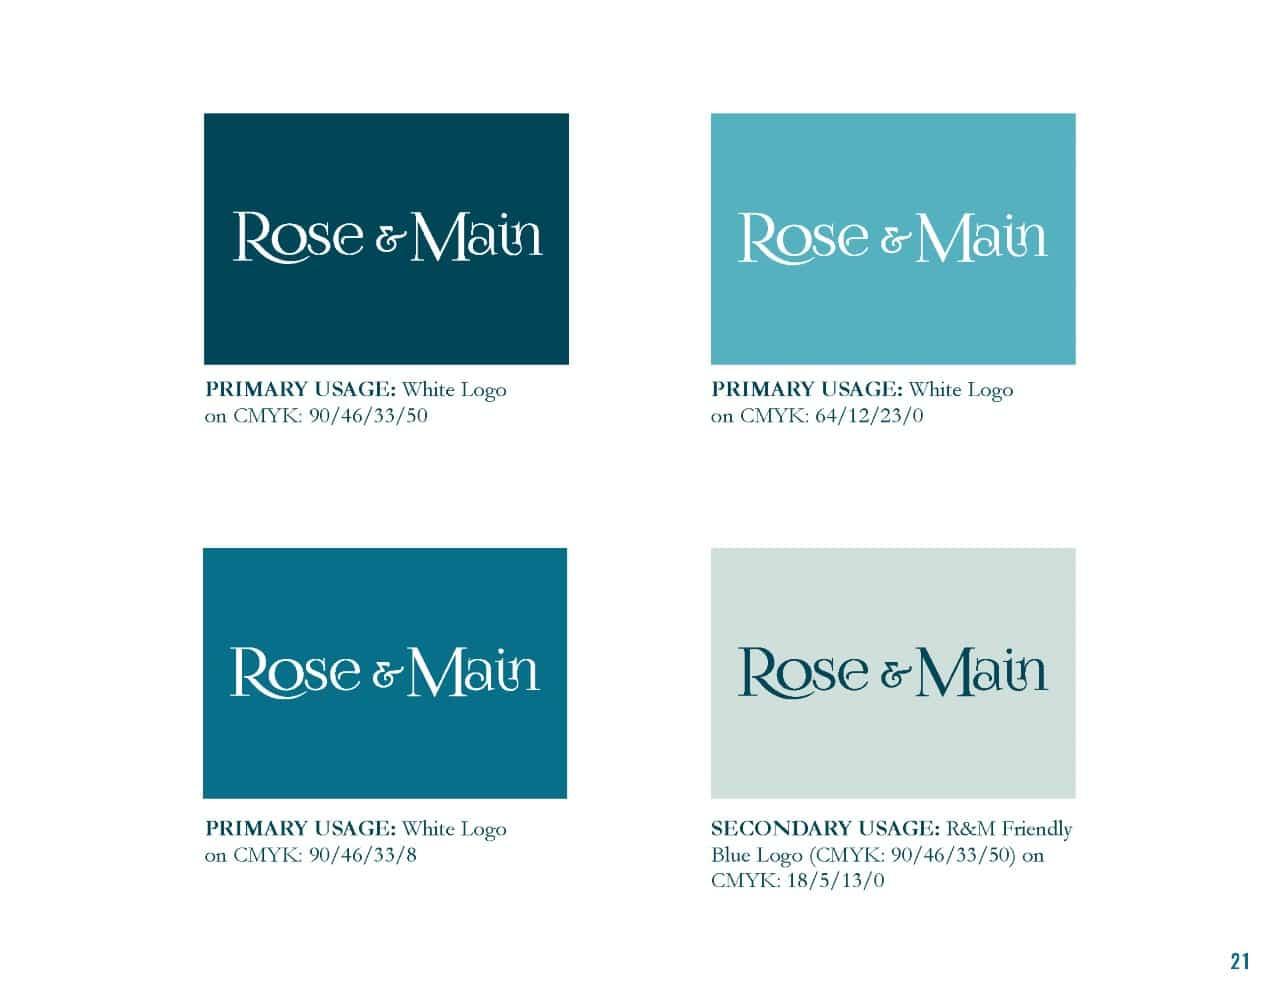 Rose & Main Brand Standards - Place Based Branding Logo Colors